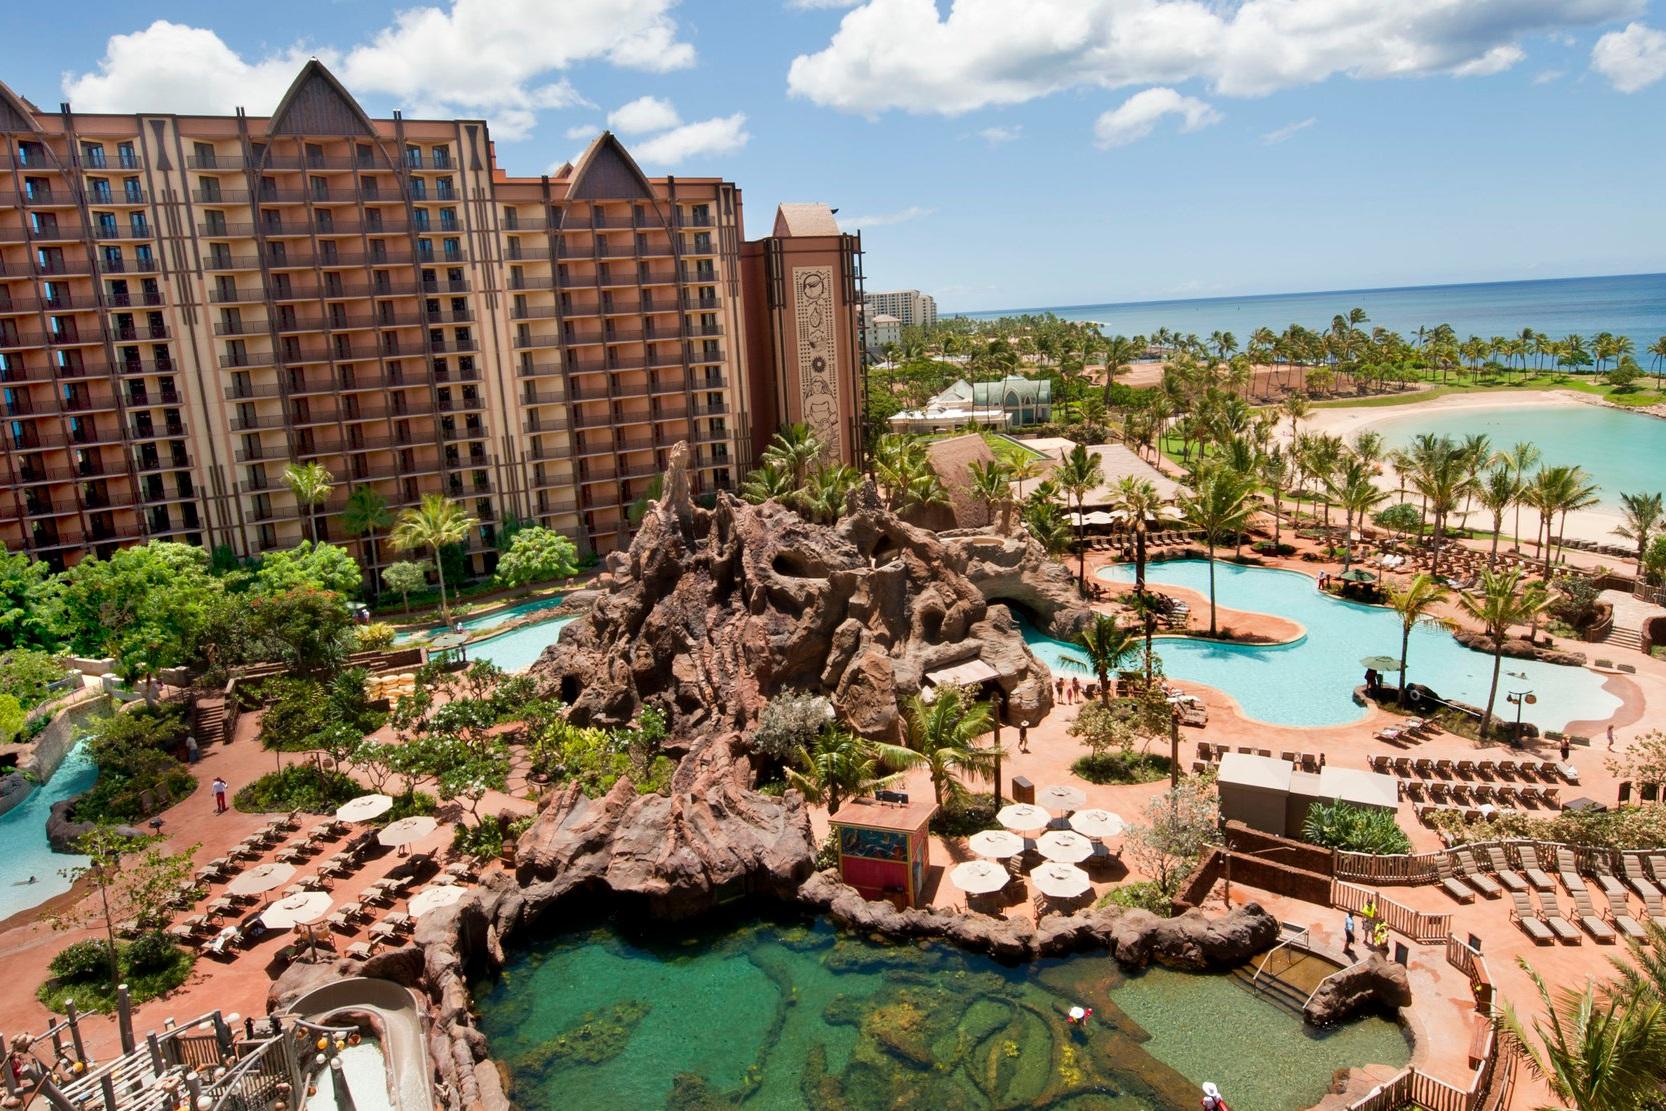 Disney's Aulani - Experience the peace and beauty of Hawaii through the magic of Disney.